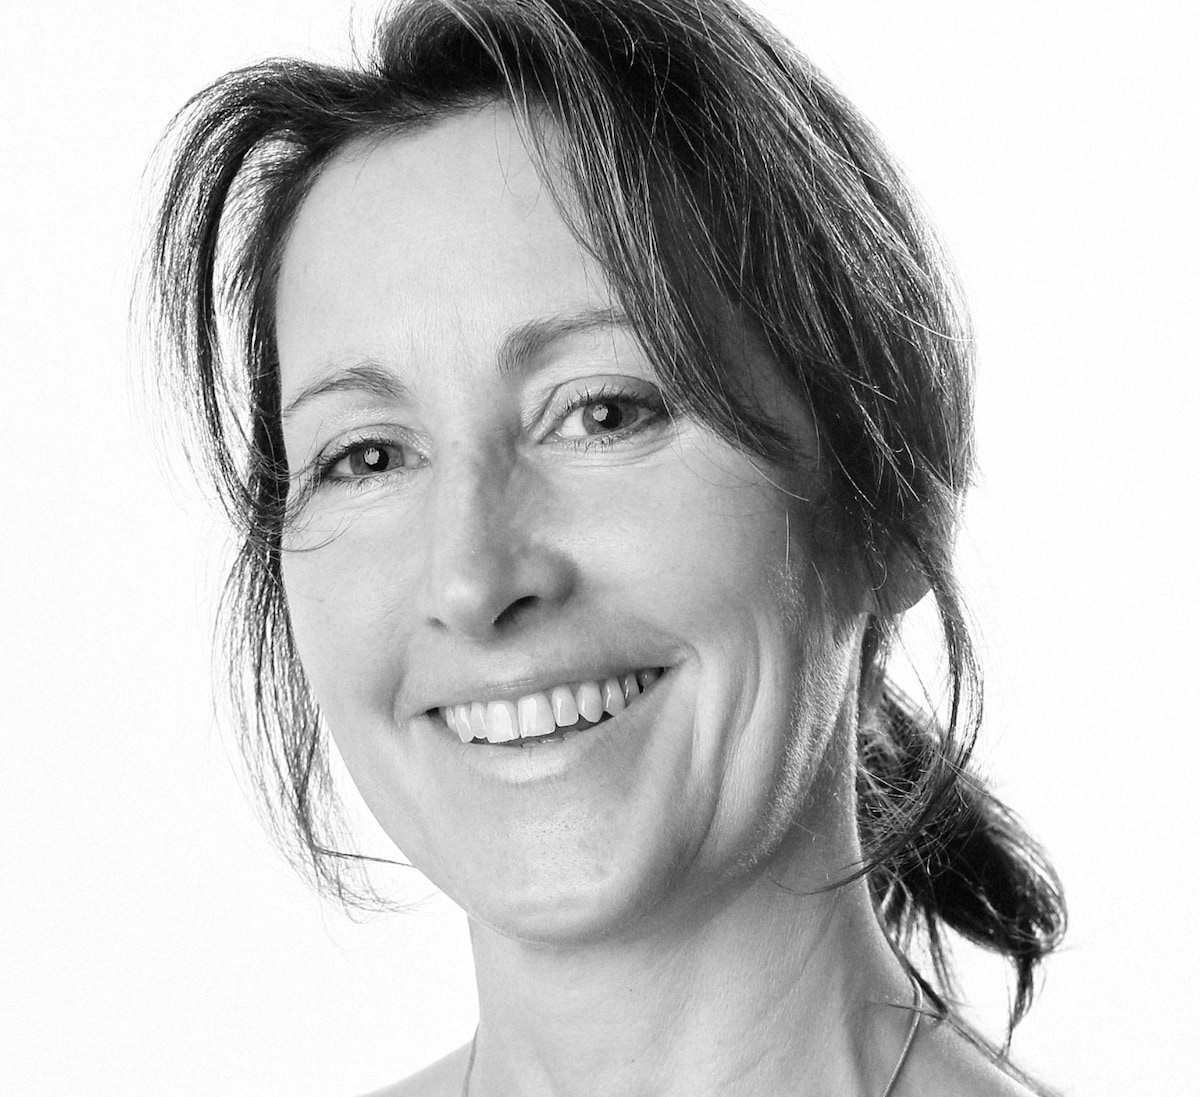 Sue From Penrith, United Kingdom